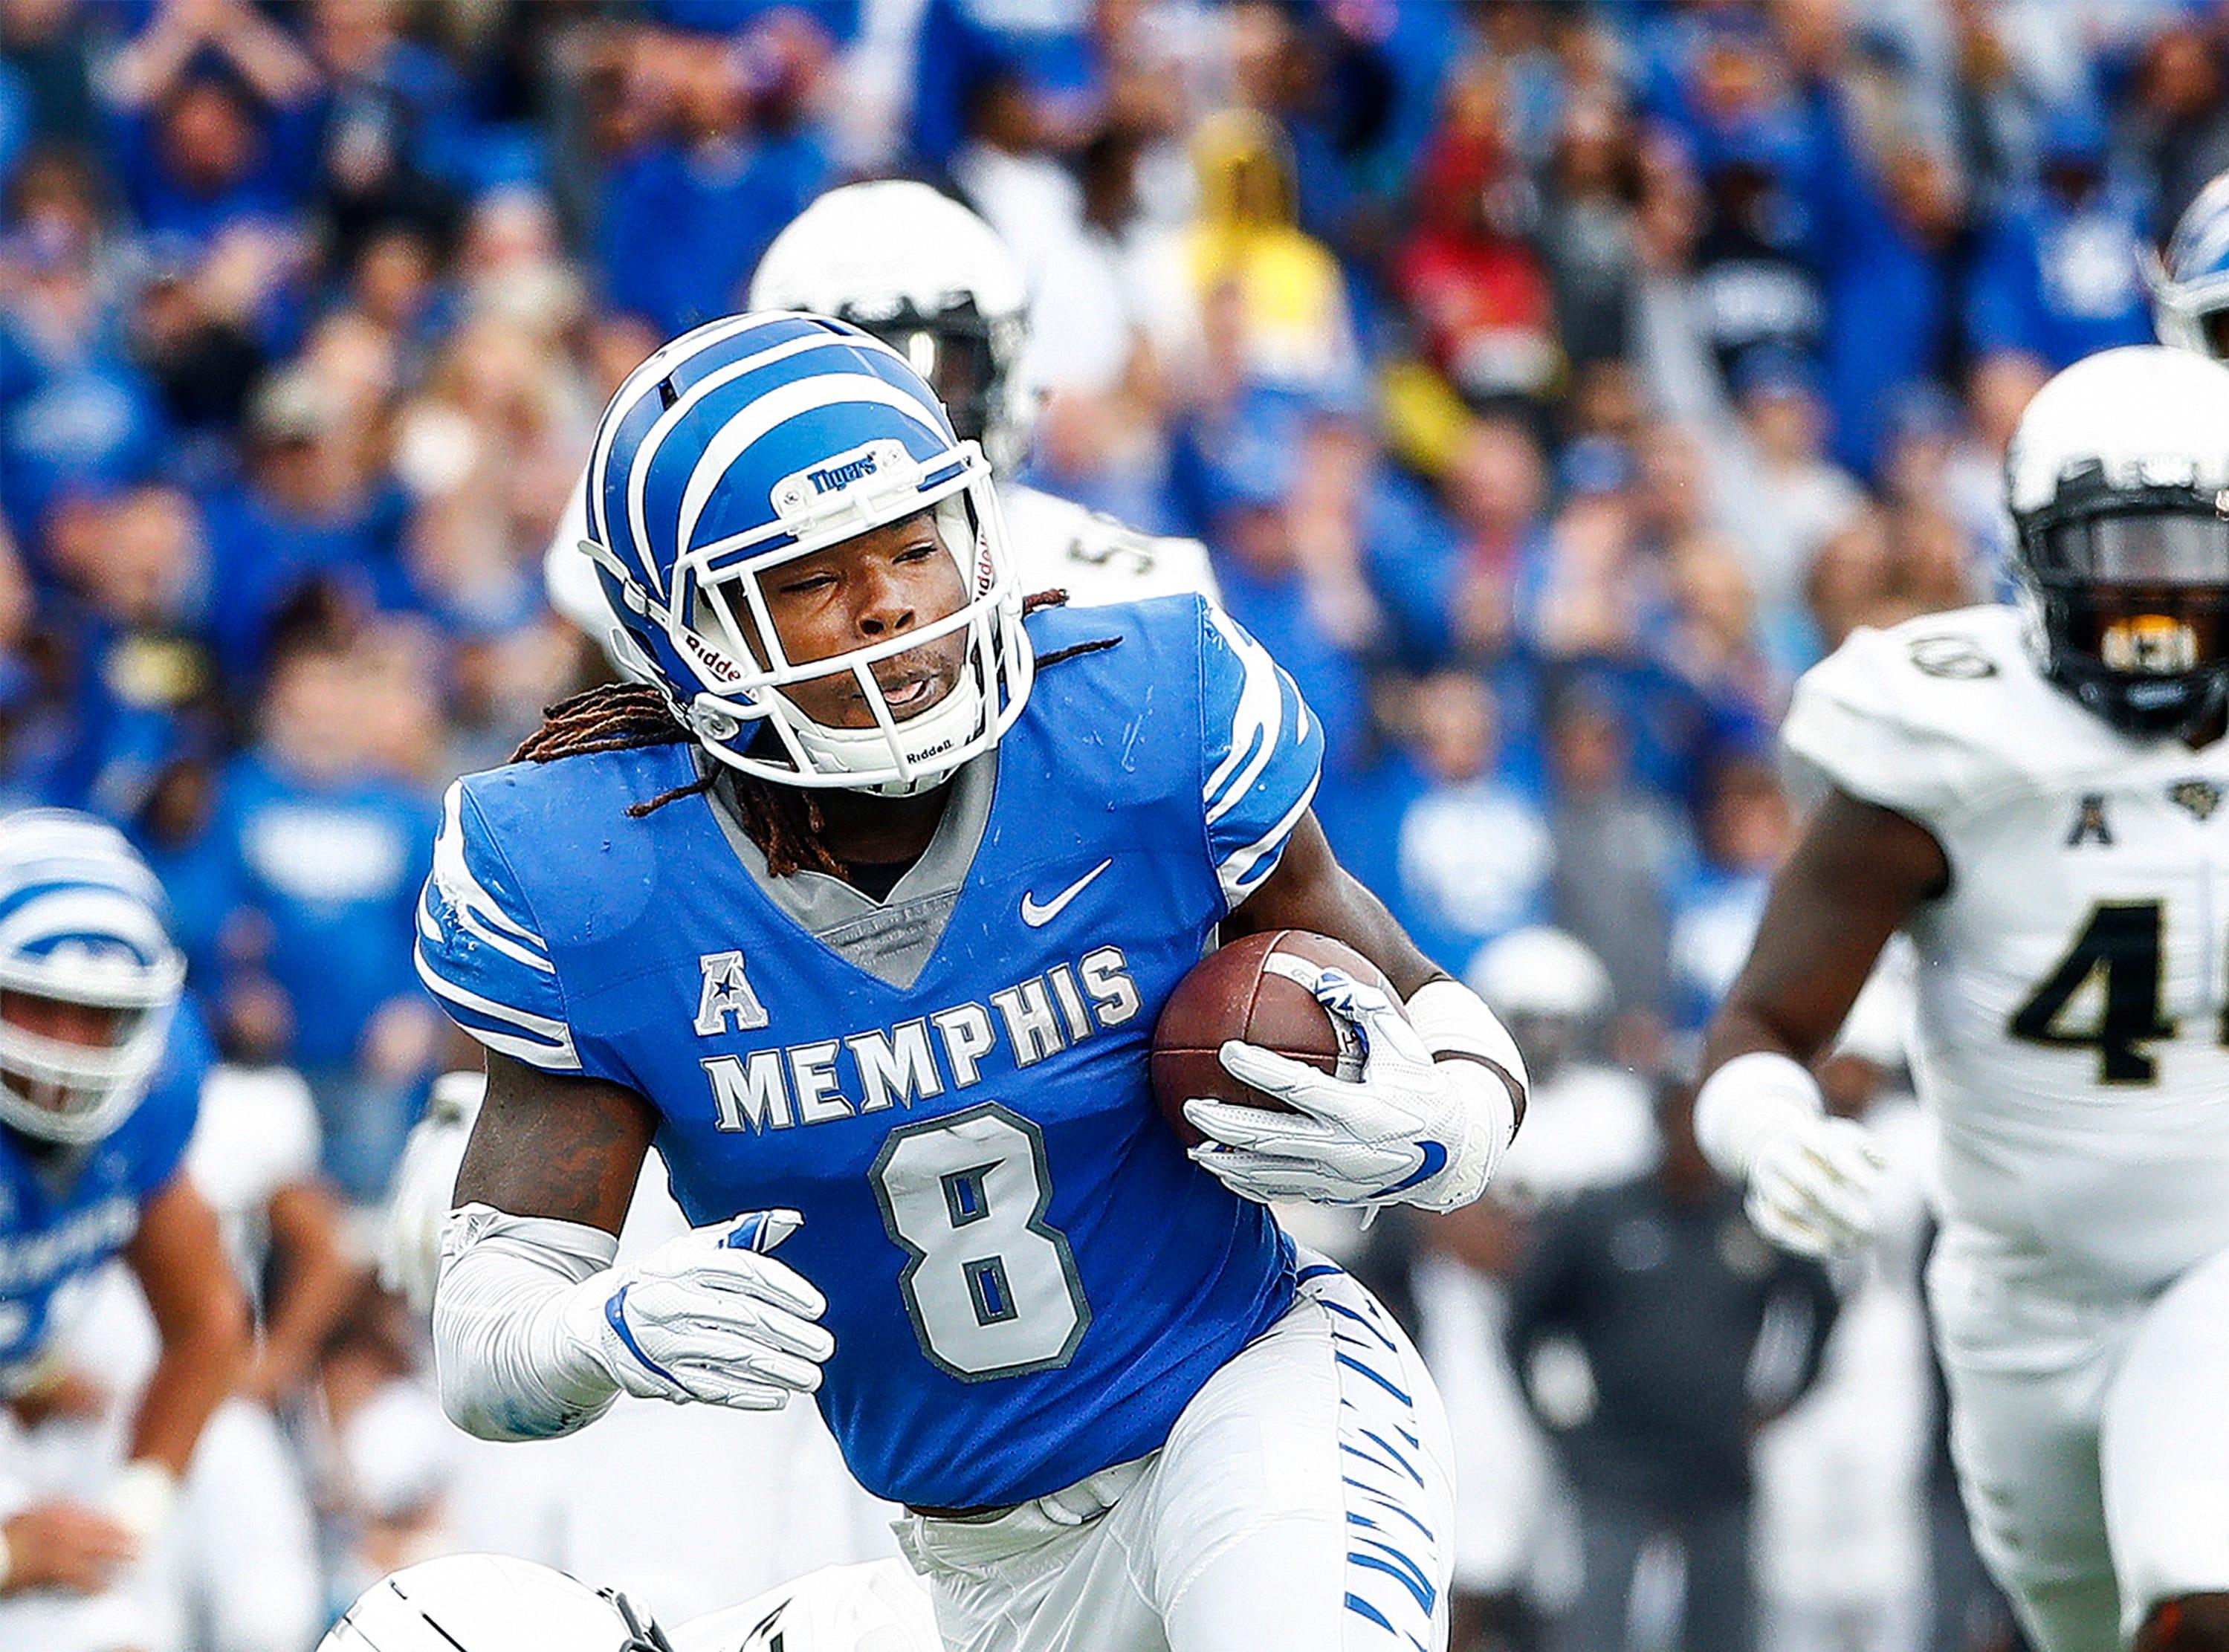 Memphis running back Darrell Henderson (top) runs past  Central Florida defender Kyle Gibson (bottom) for a touchdown during acton in Memphis, Tenn., Saturday, October 13, 2018.